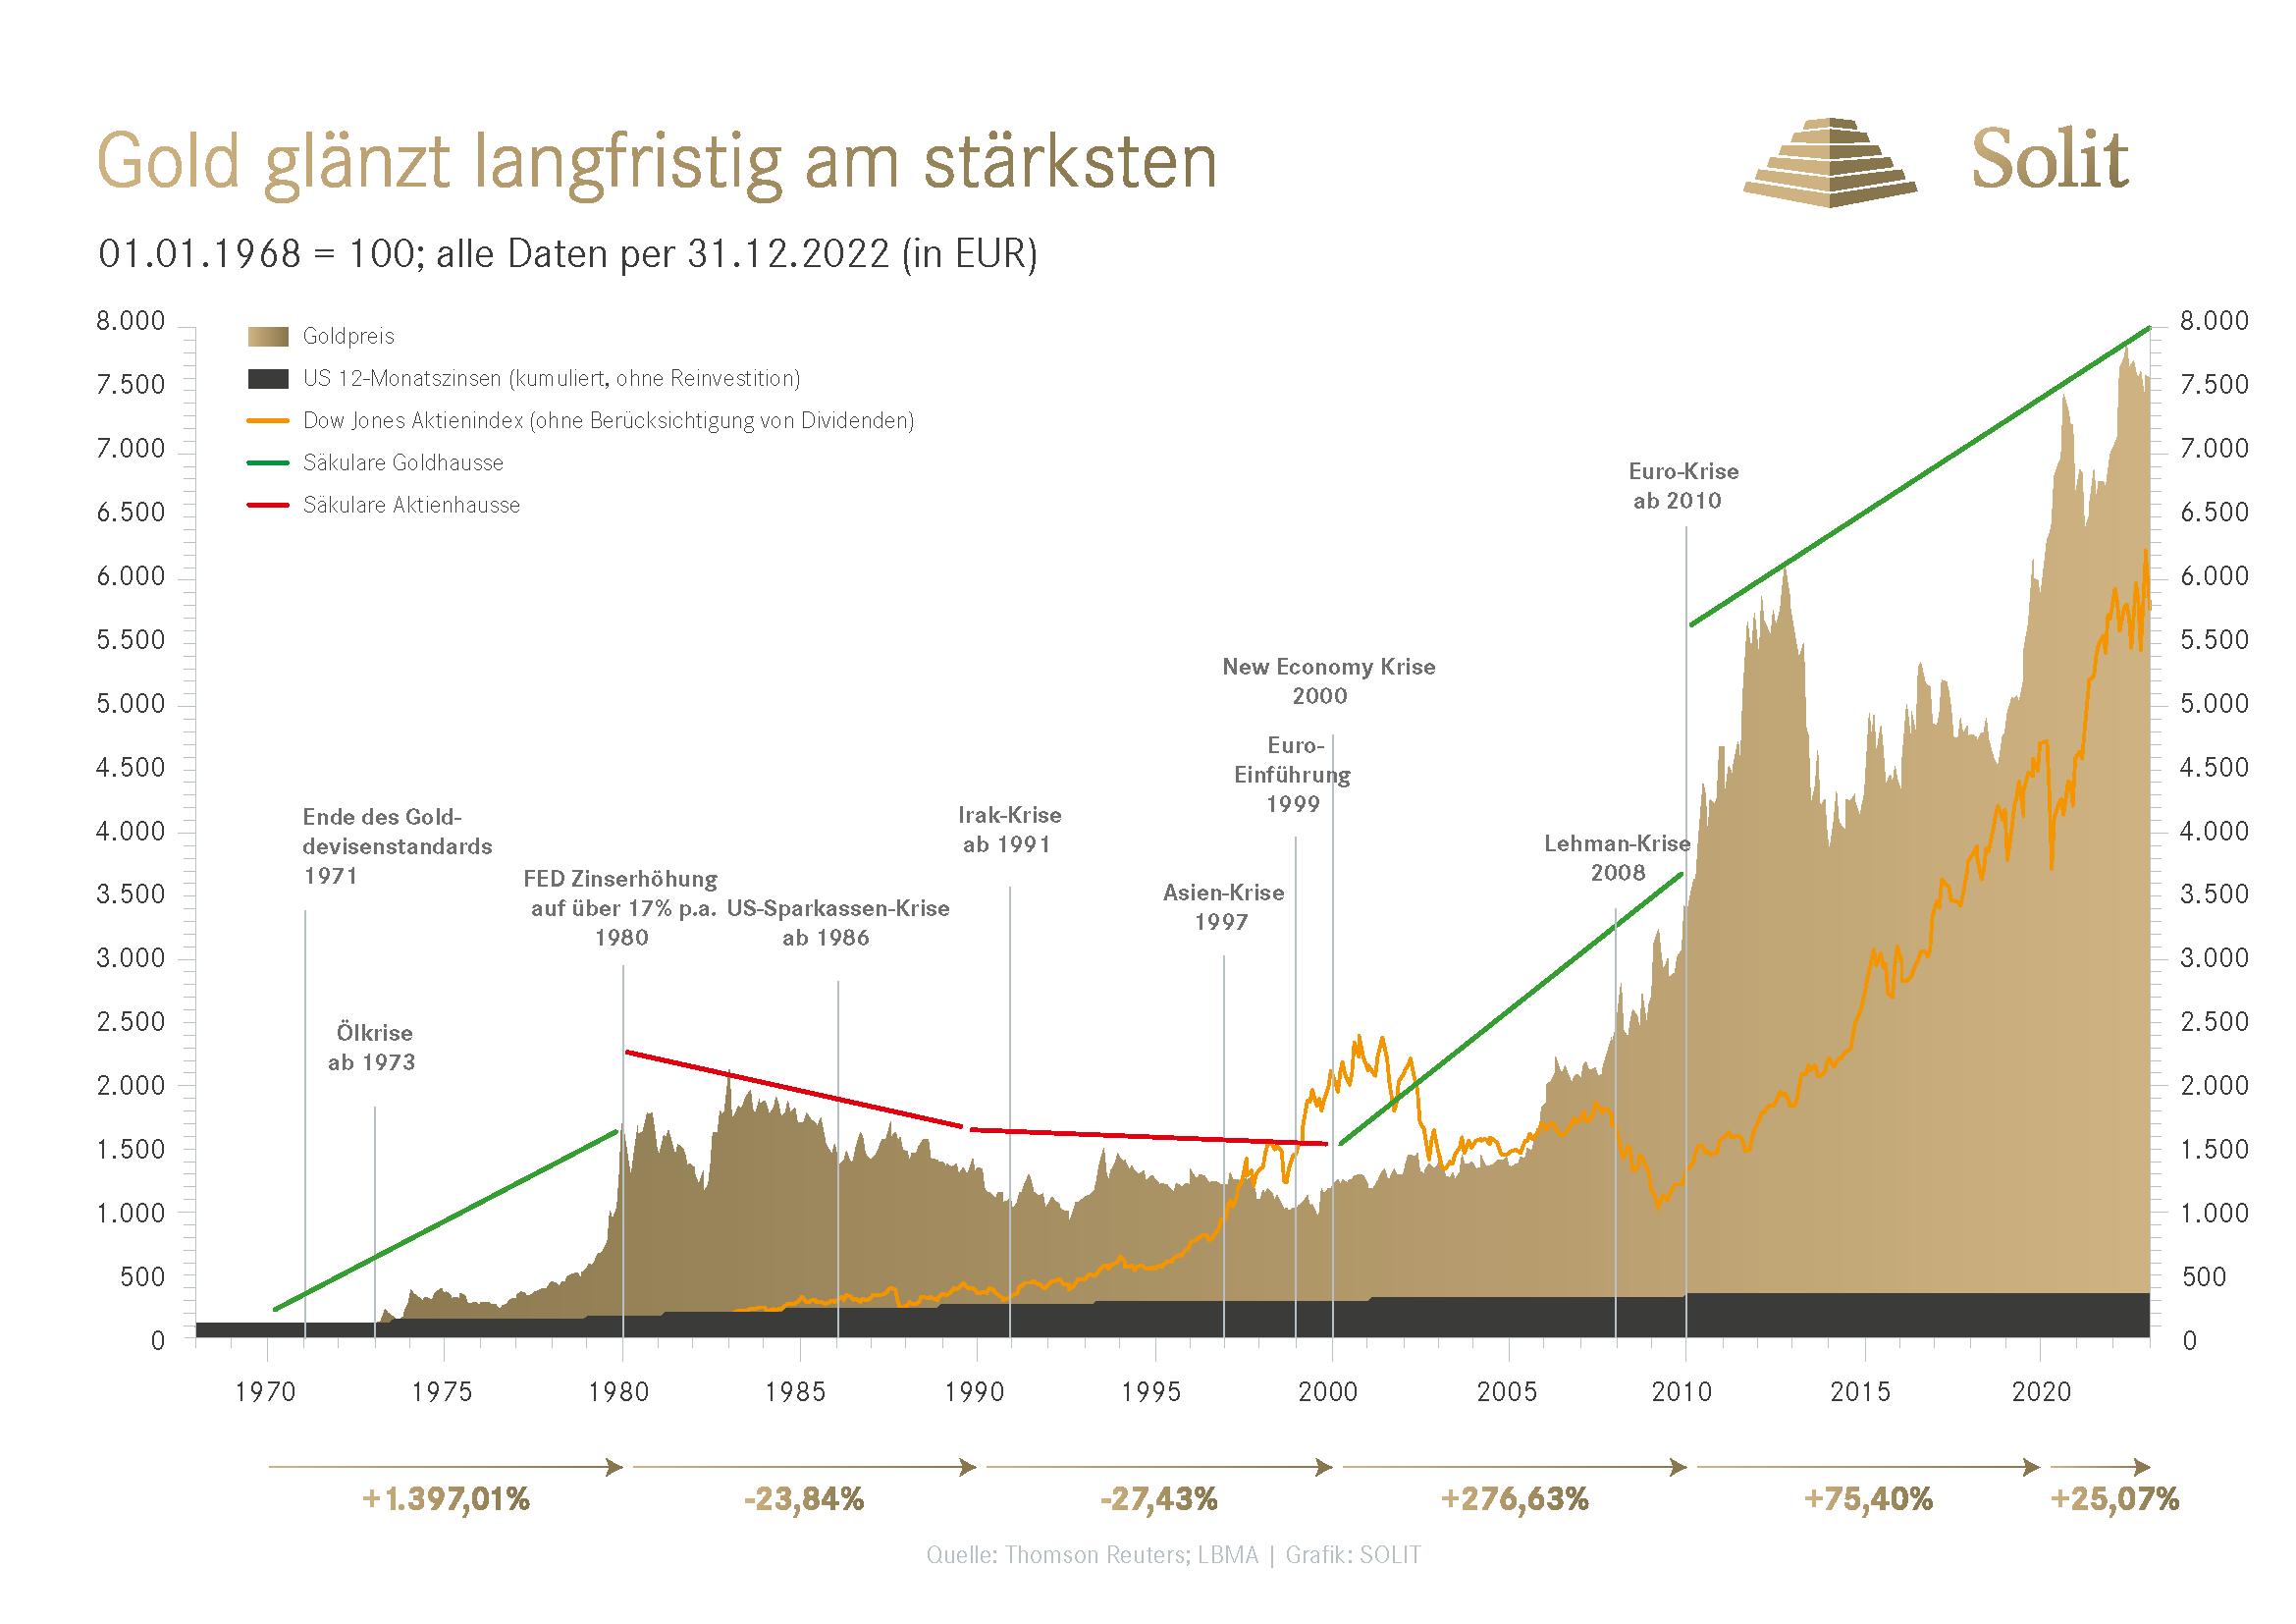 Langzeitchart | Gold glänzt langfristig am stärksten | EURO